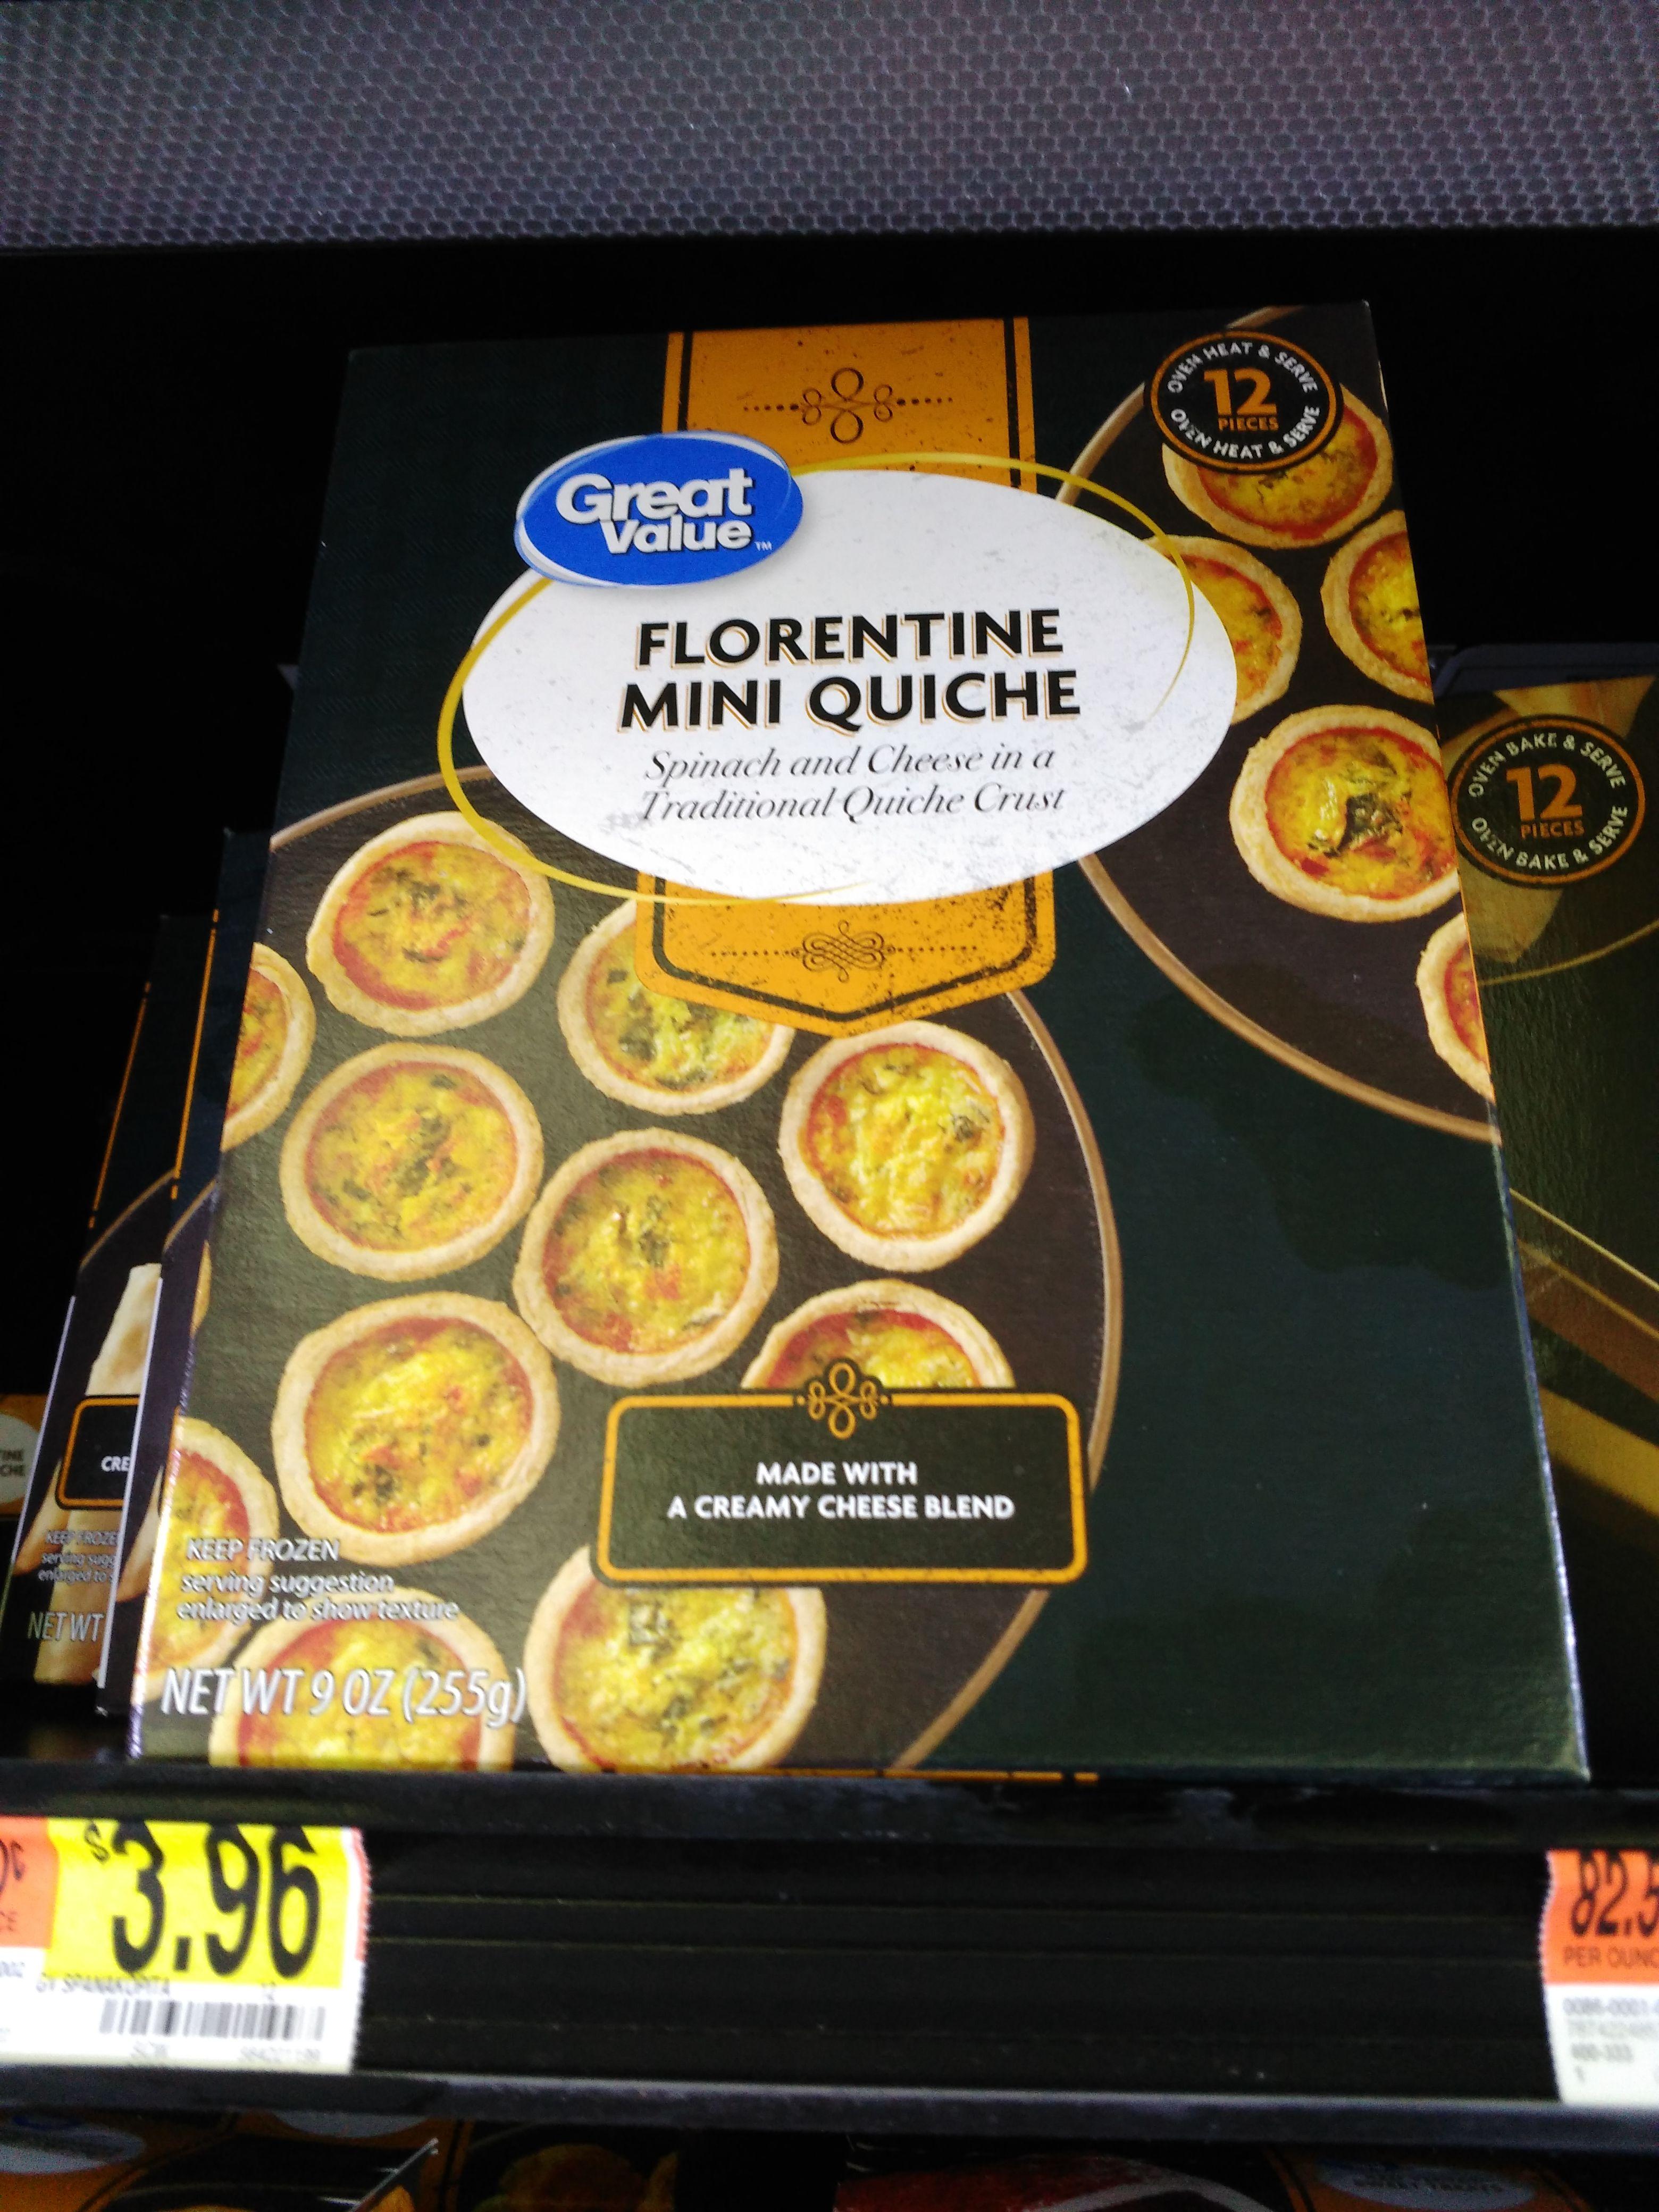 great value florentine mini quiches mini quiche spinach and cheese snacks great value florentine mini quiches